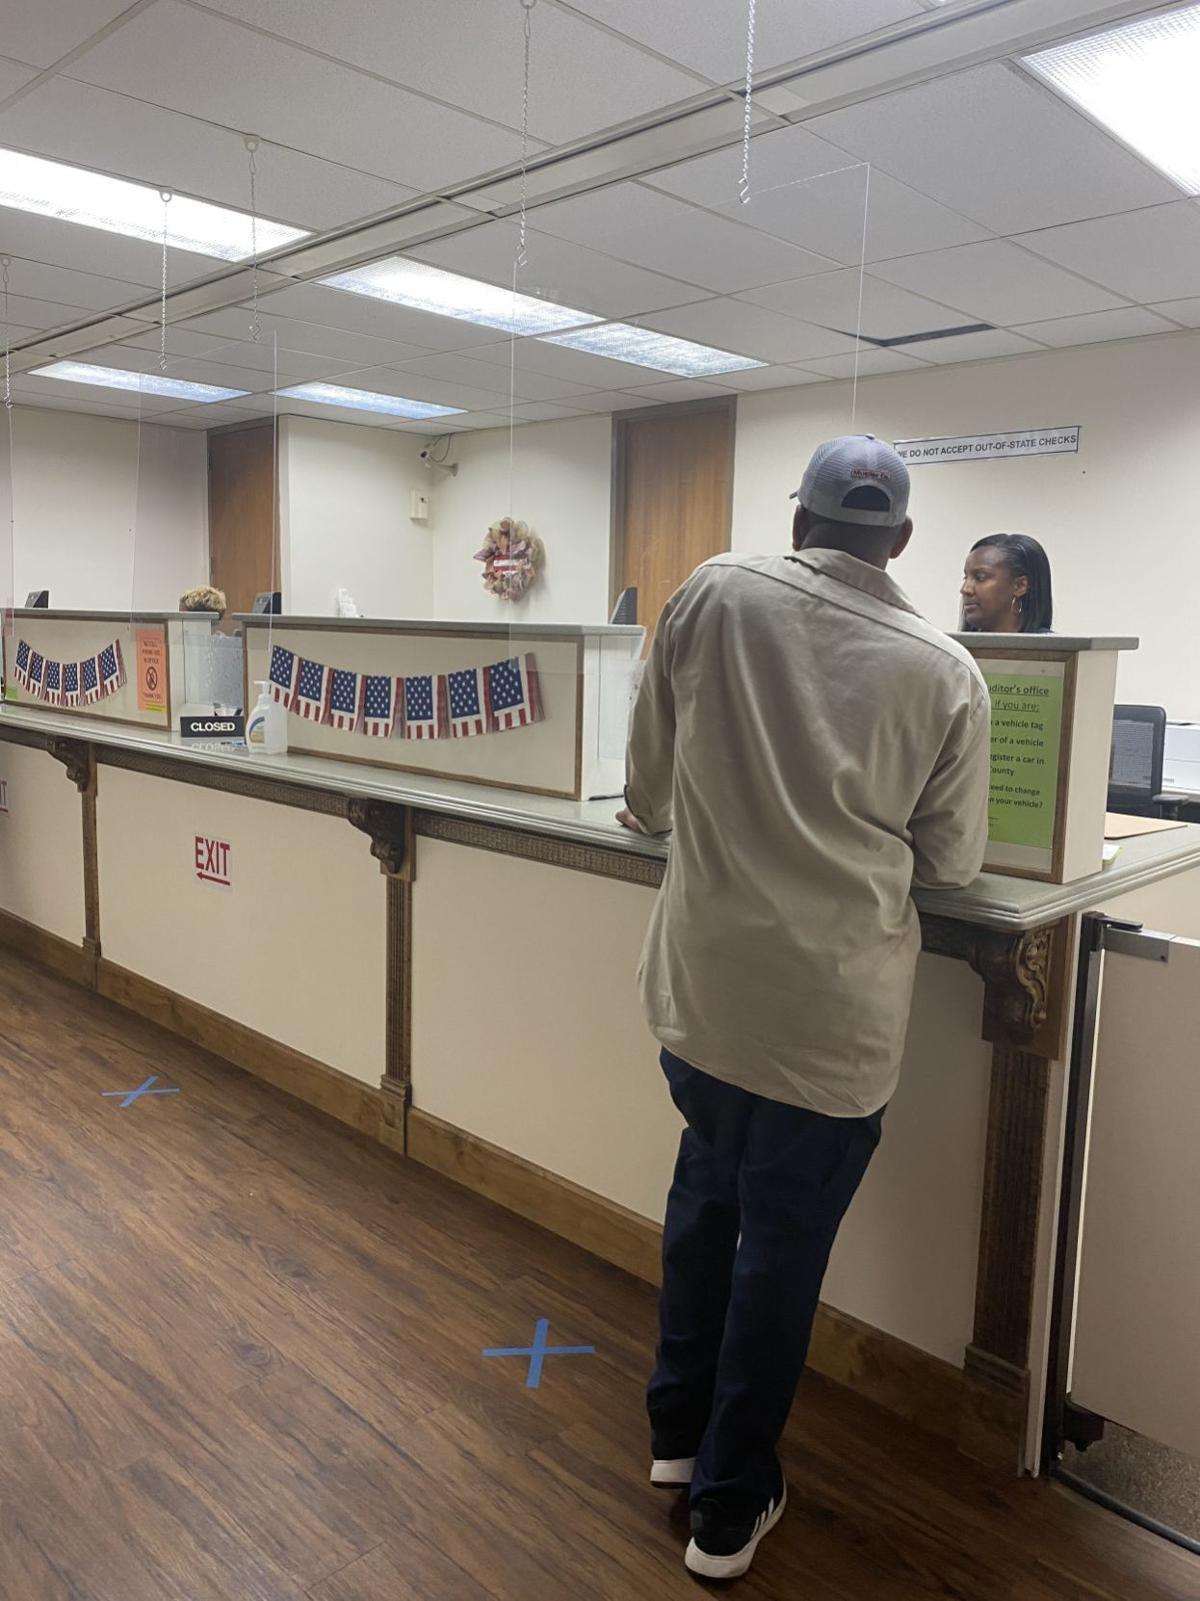 Gwd County Tax office